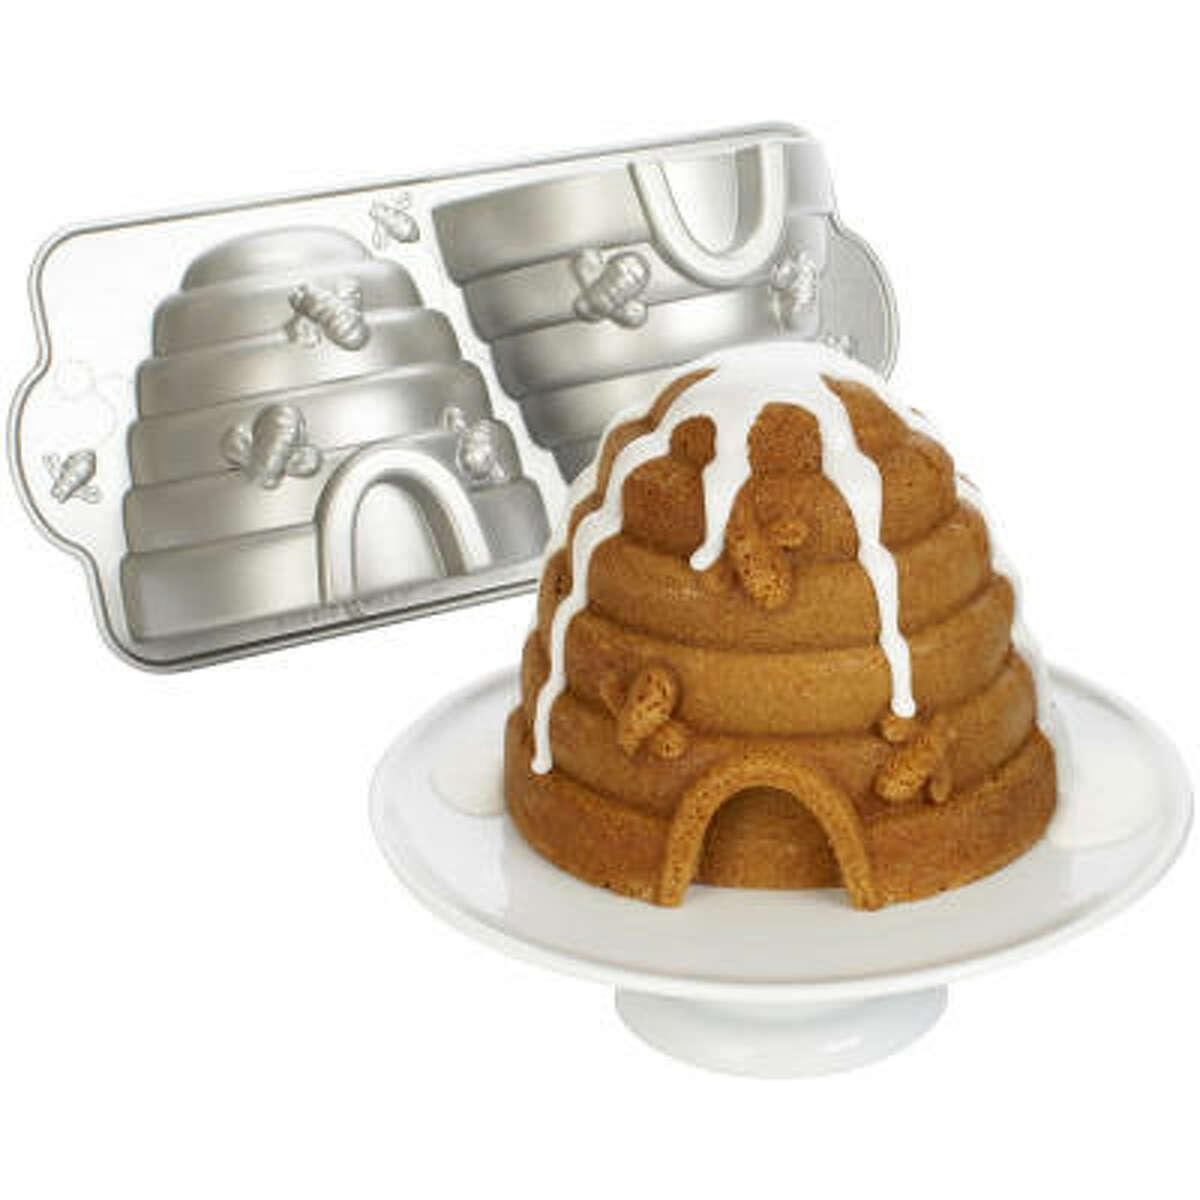 Nordic Ware Beehive Bundt Pan, $36 at Sur La Table